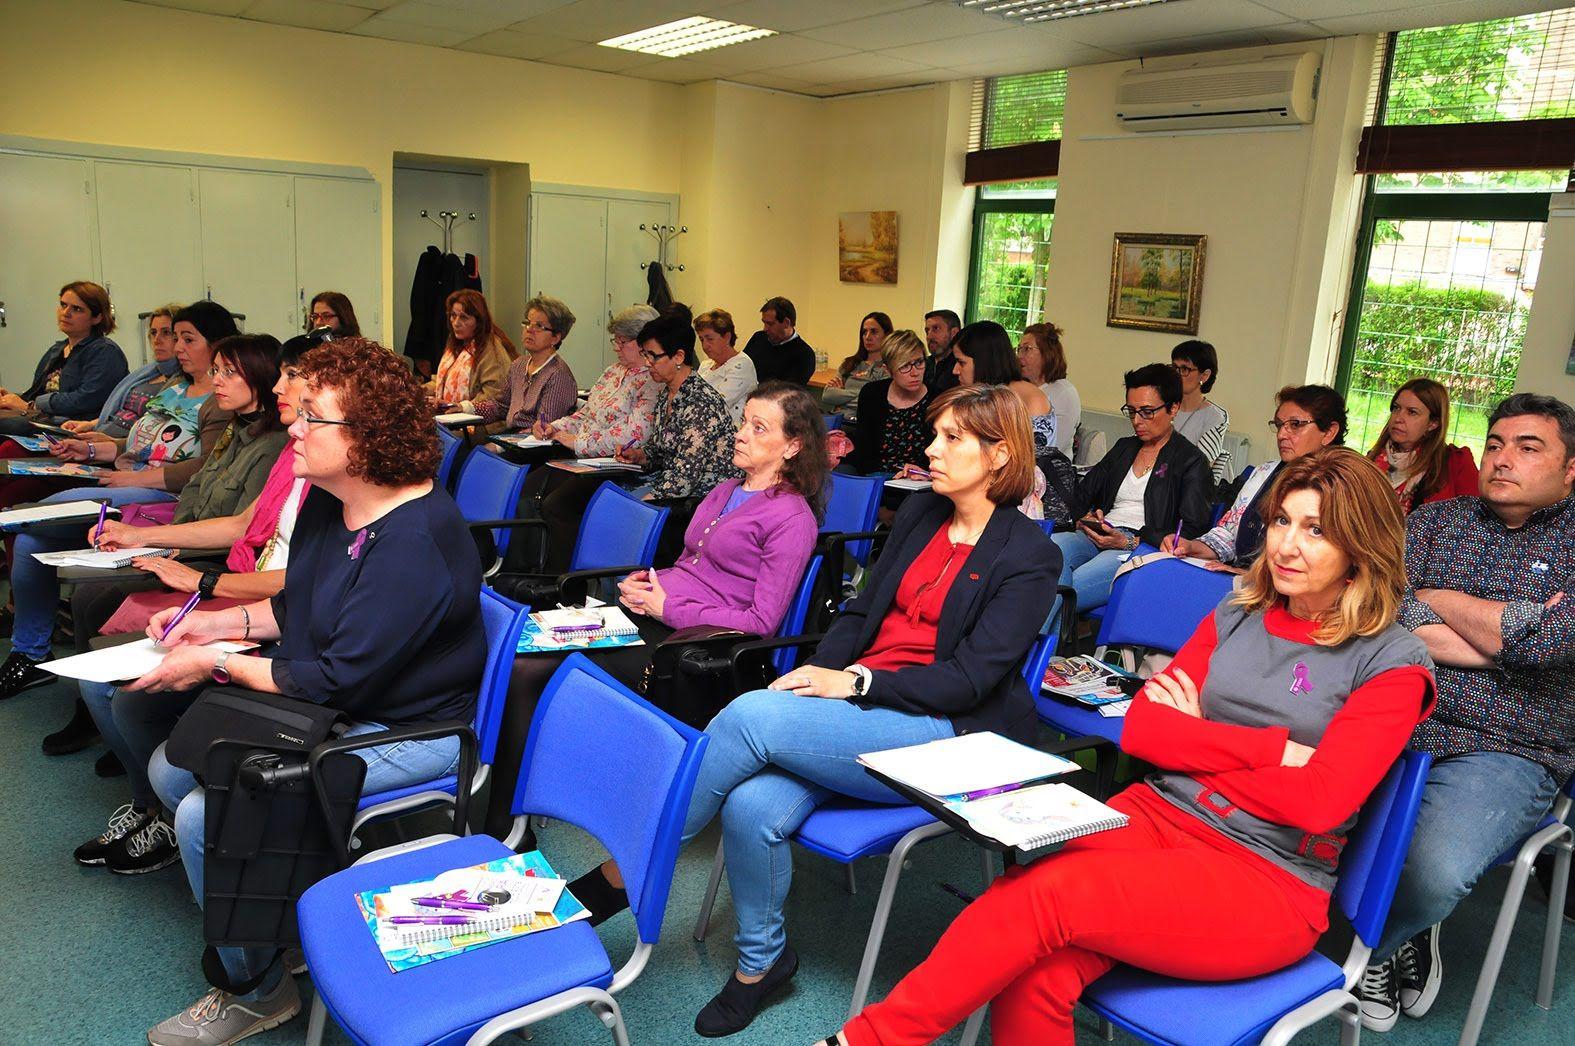 VII-Jornadas-Formacion-OM-STECyL-i-Valladolid-24M2018-FLS_2369